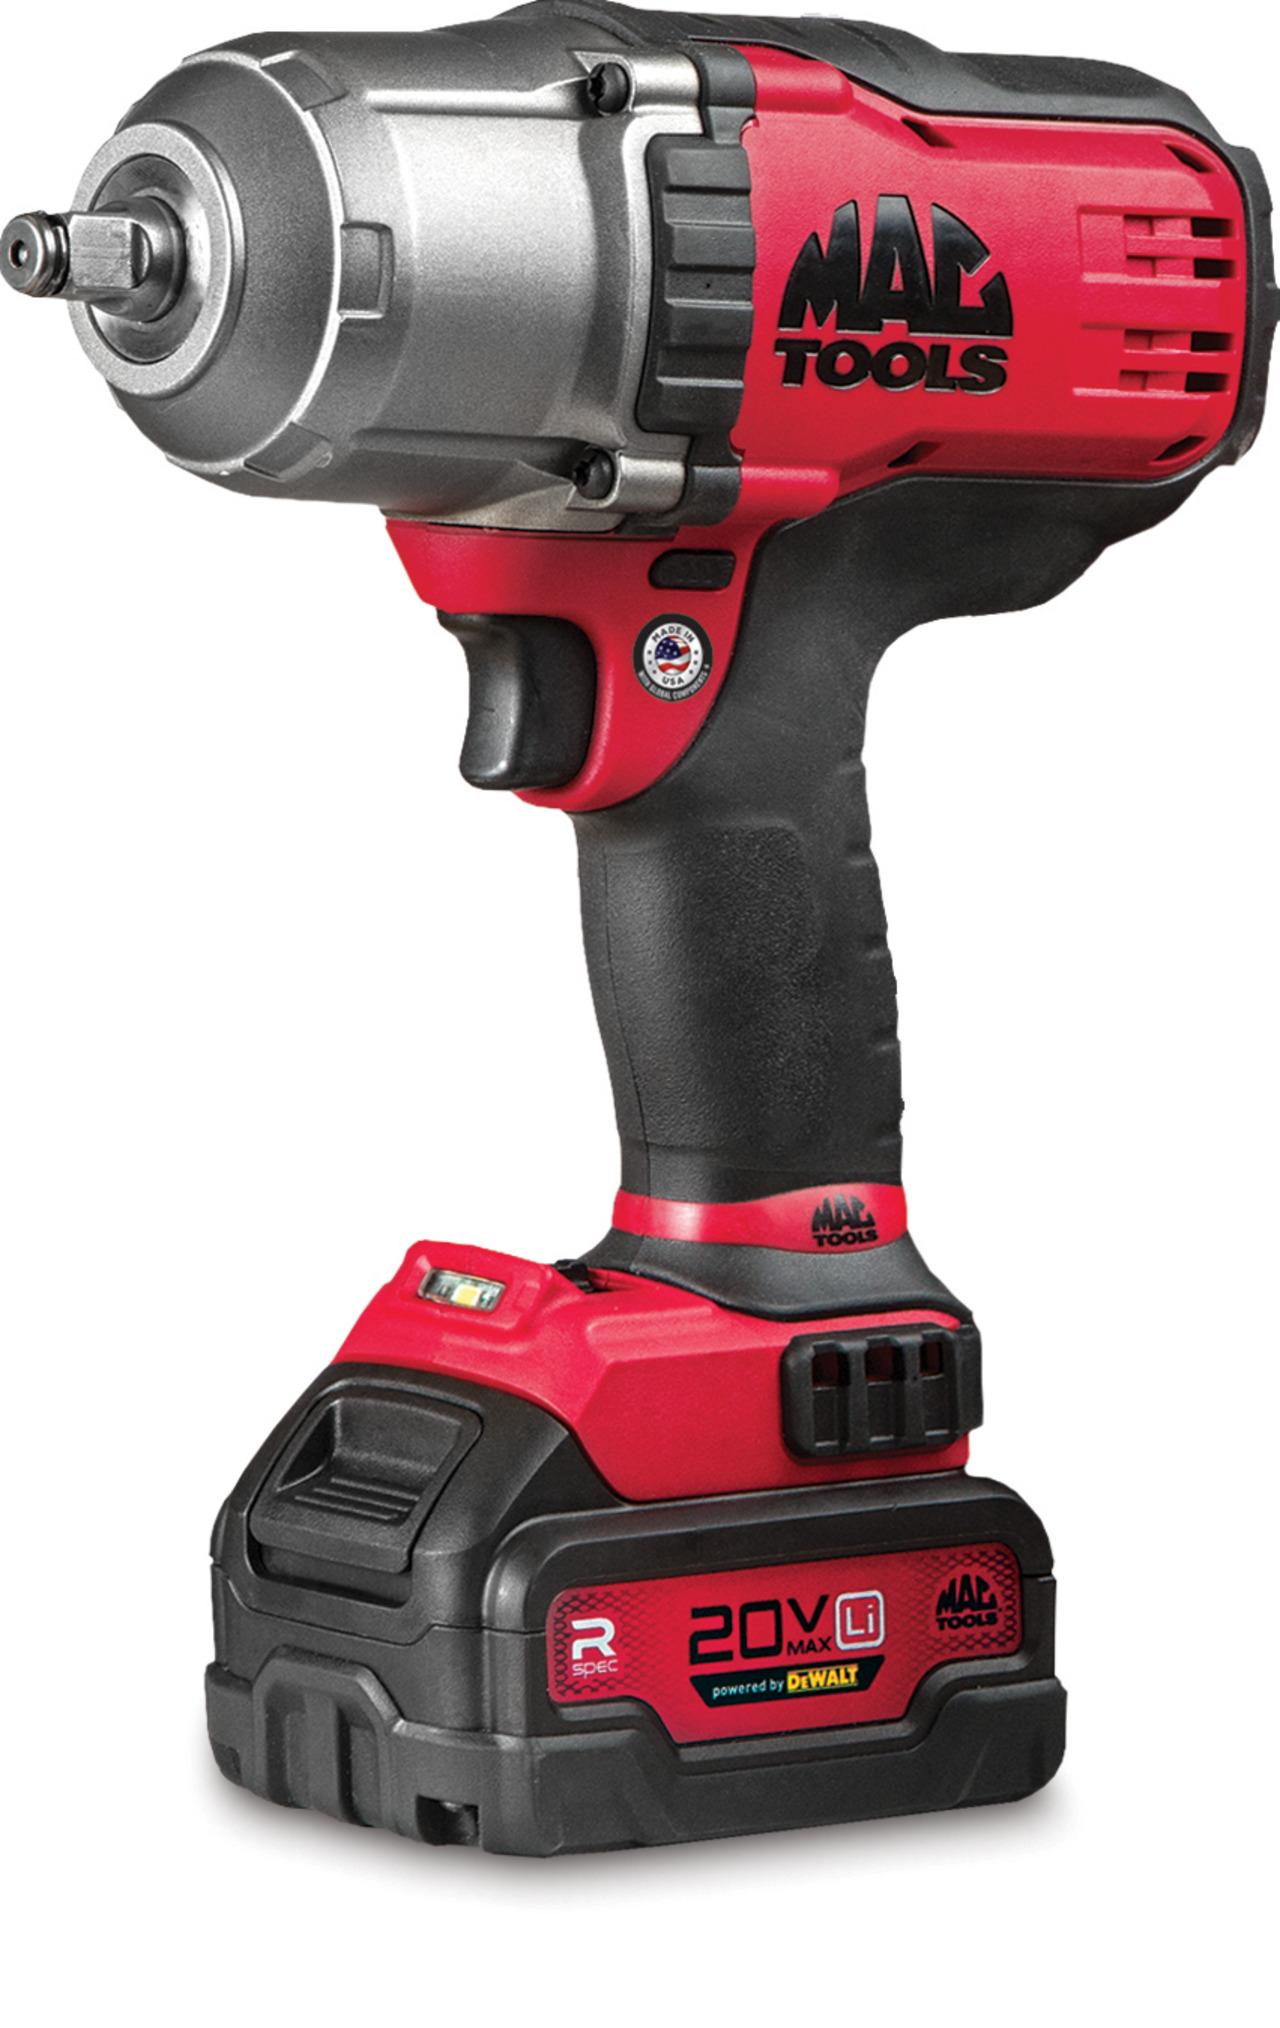 Mac tools 1/2 impact wrench 18v bruiser